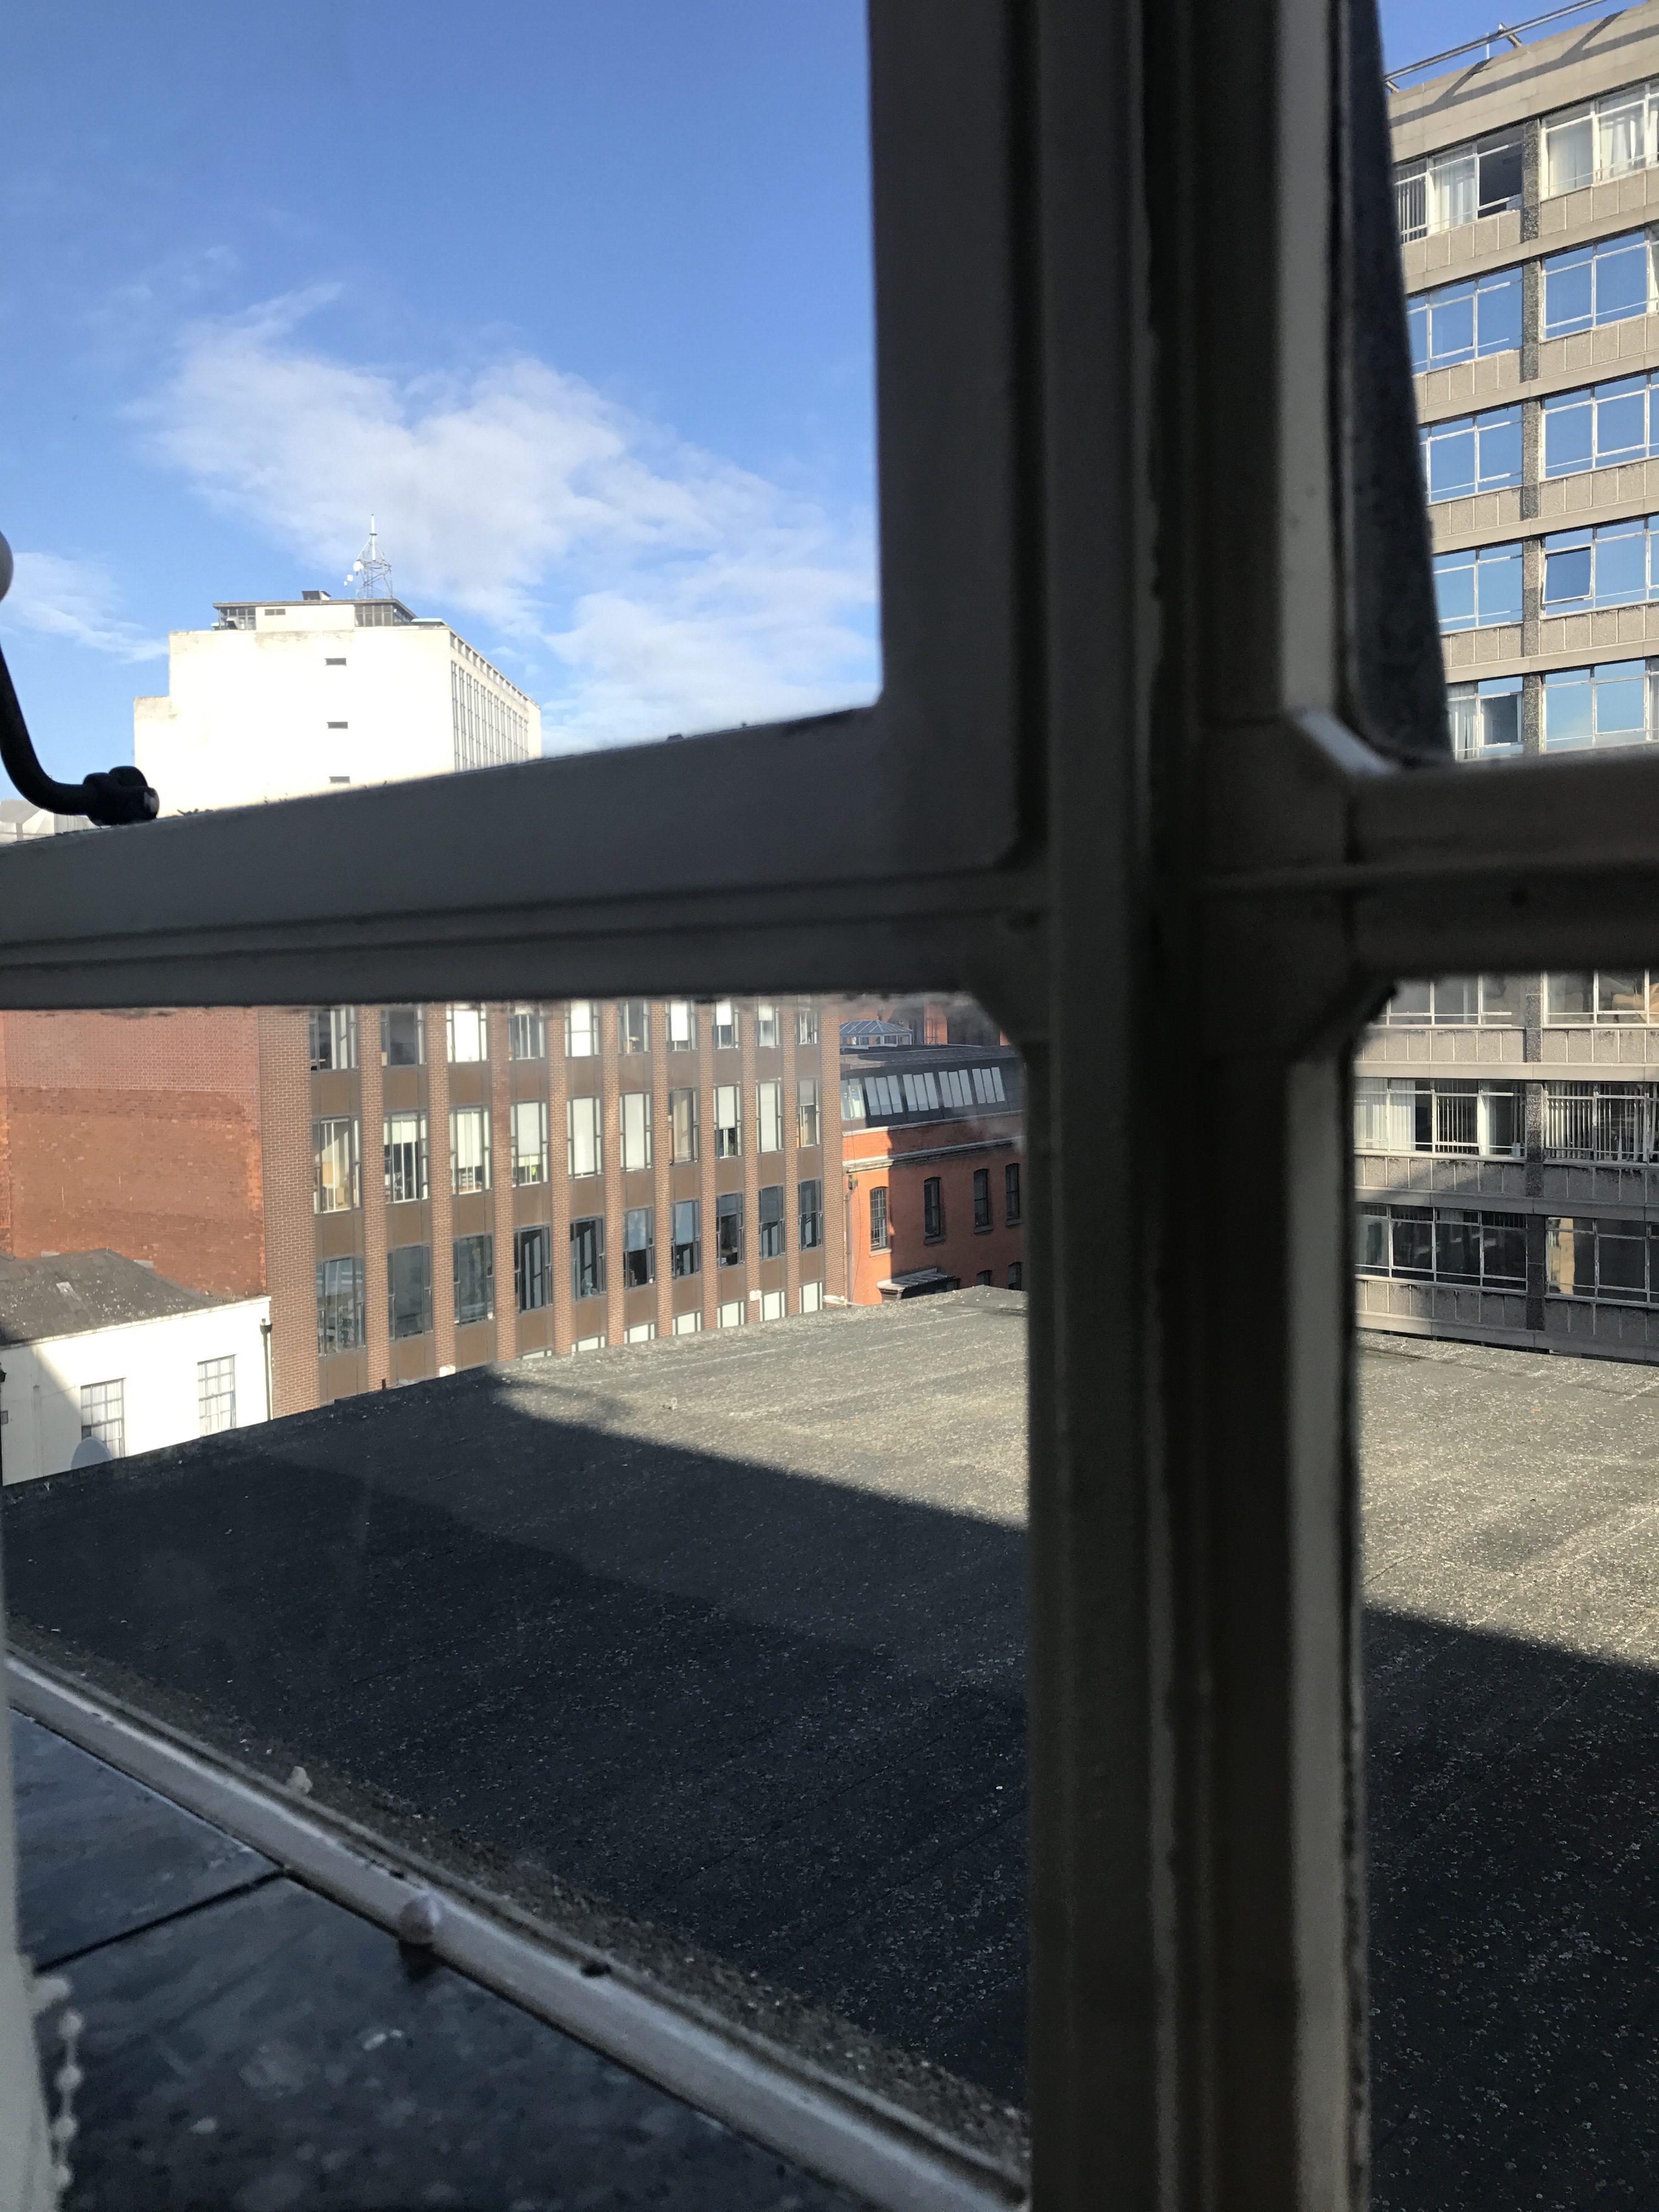 window, cityscape, blue skies